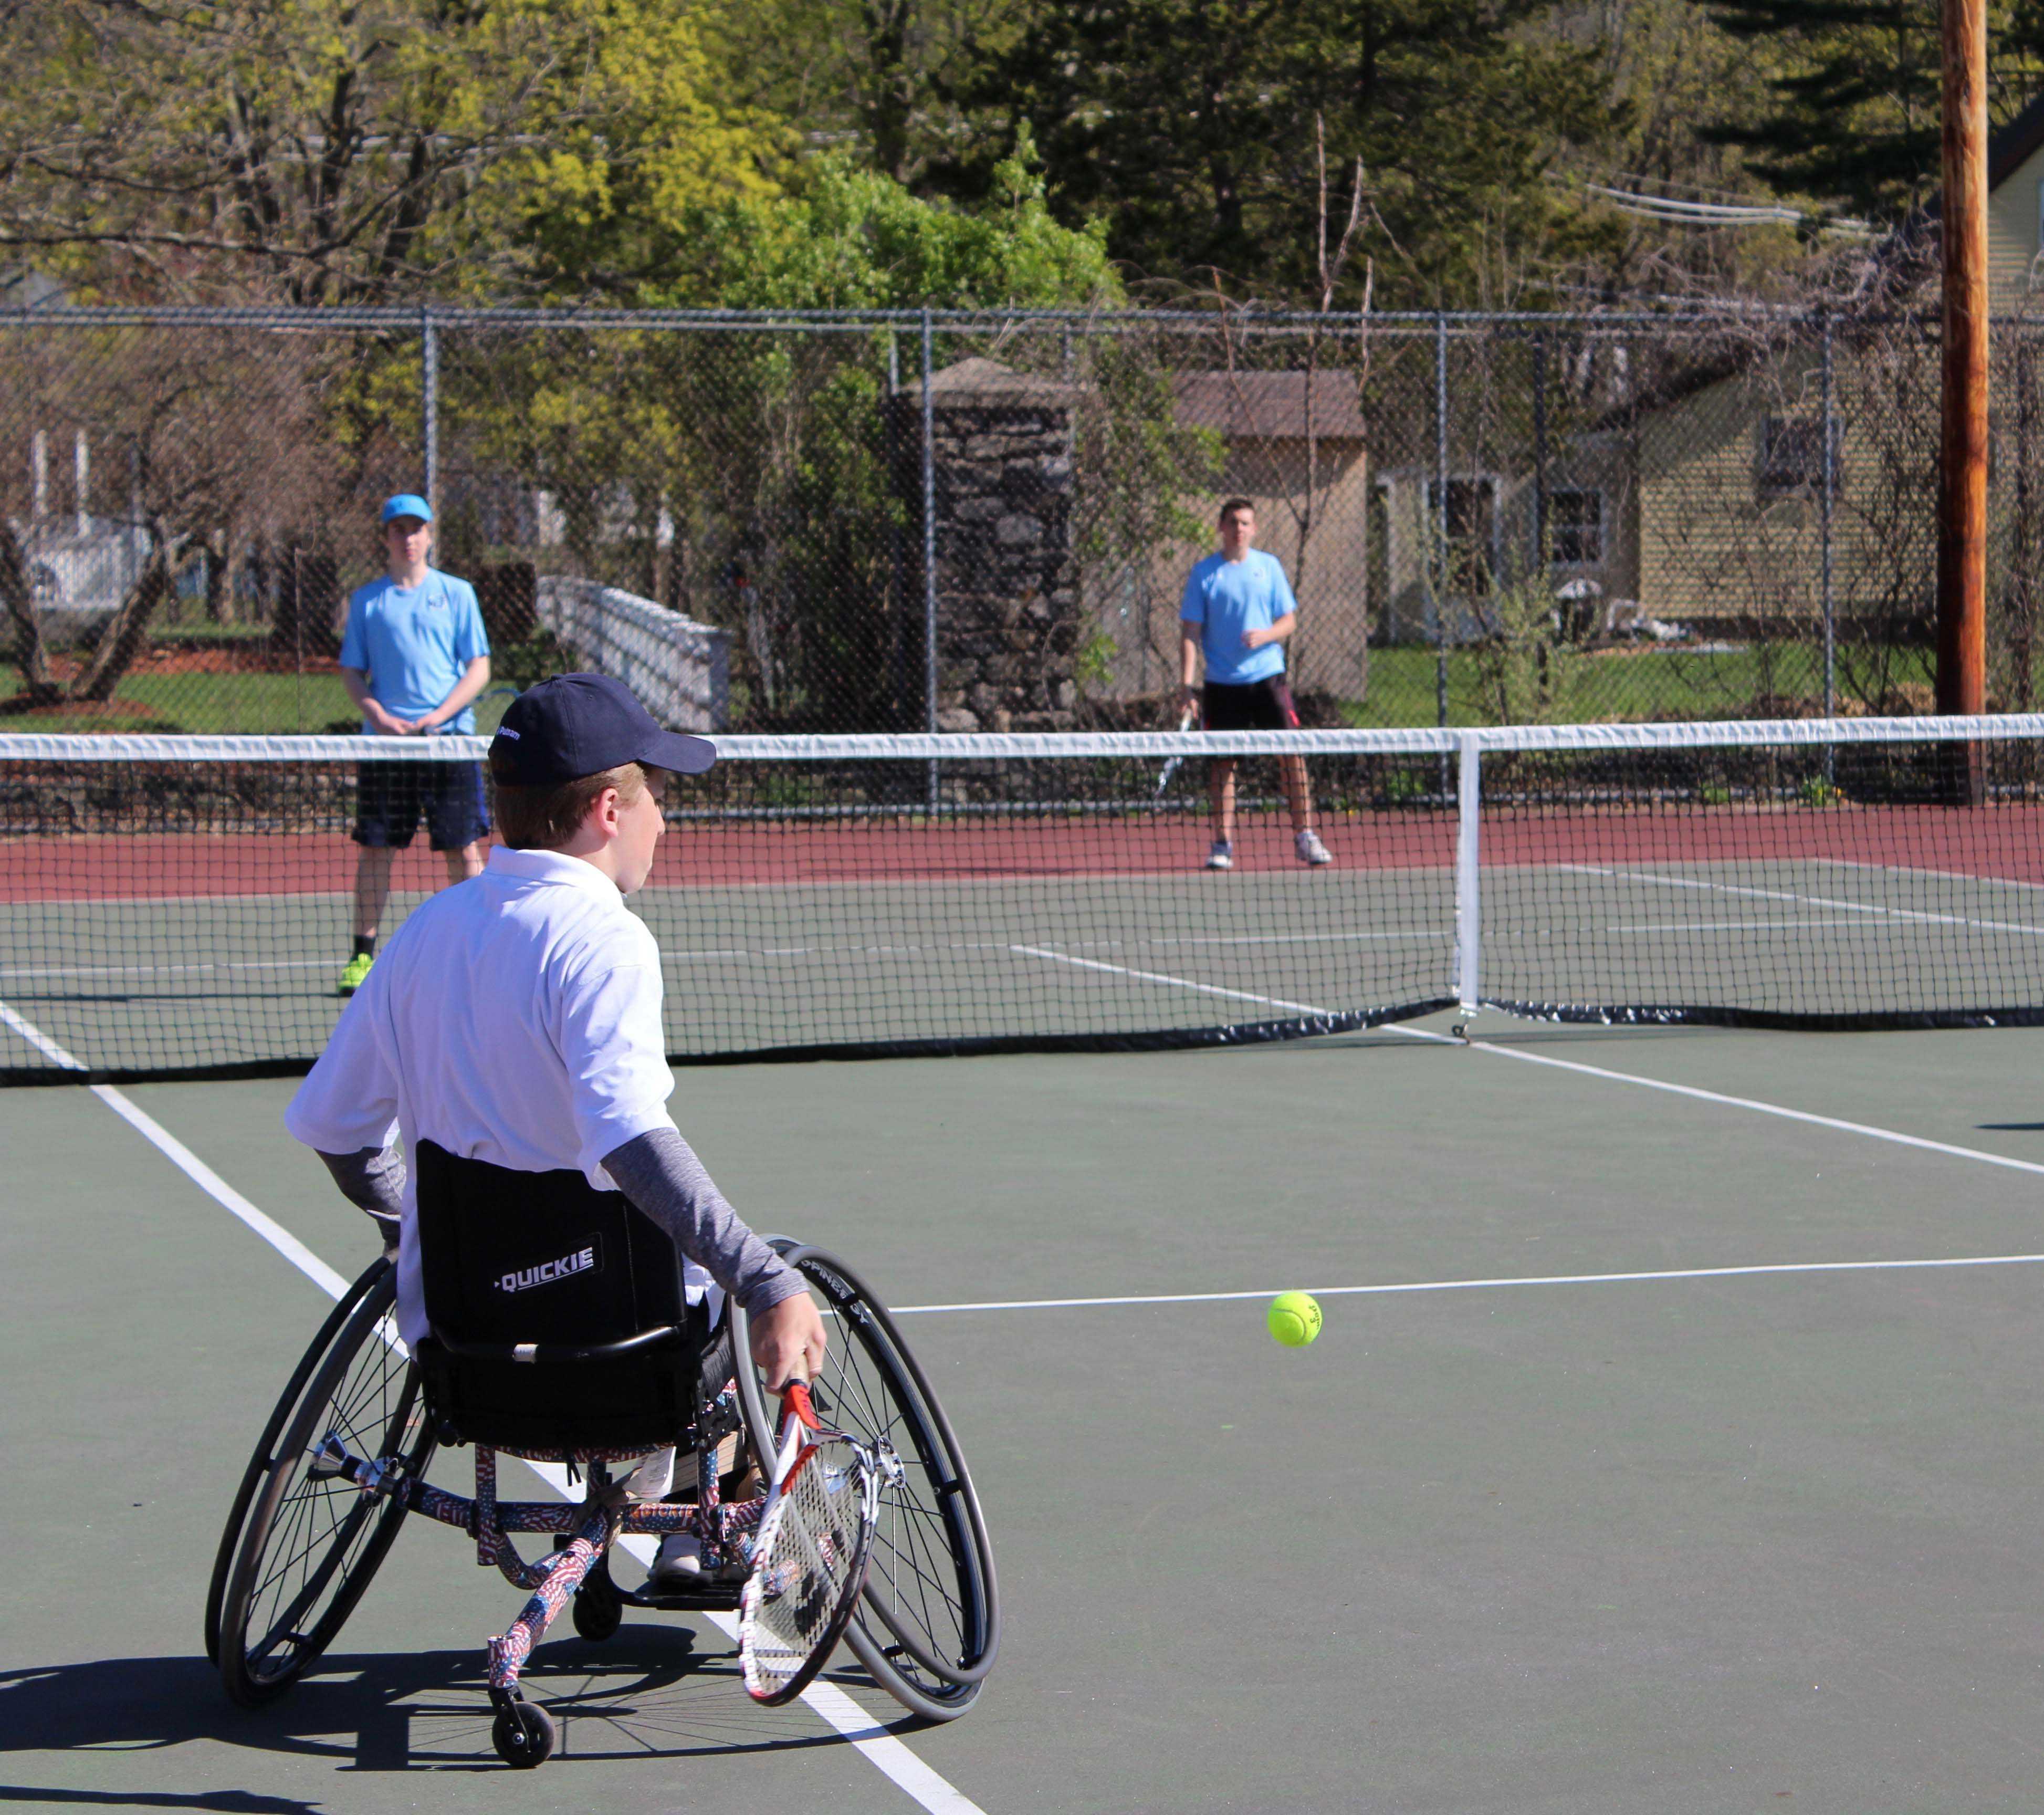 Owen Anketell Becomes Hudson's First Wheelchair Tennis Player